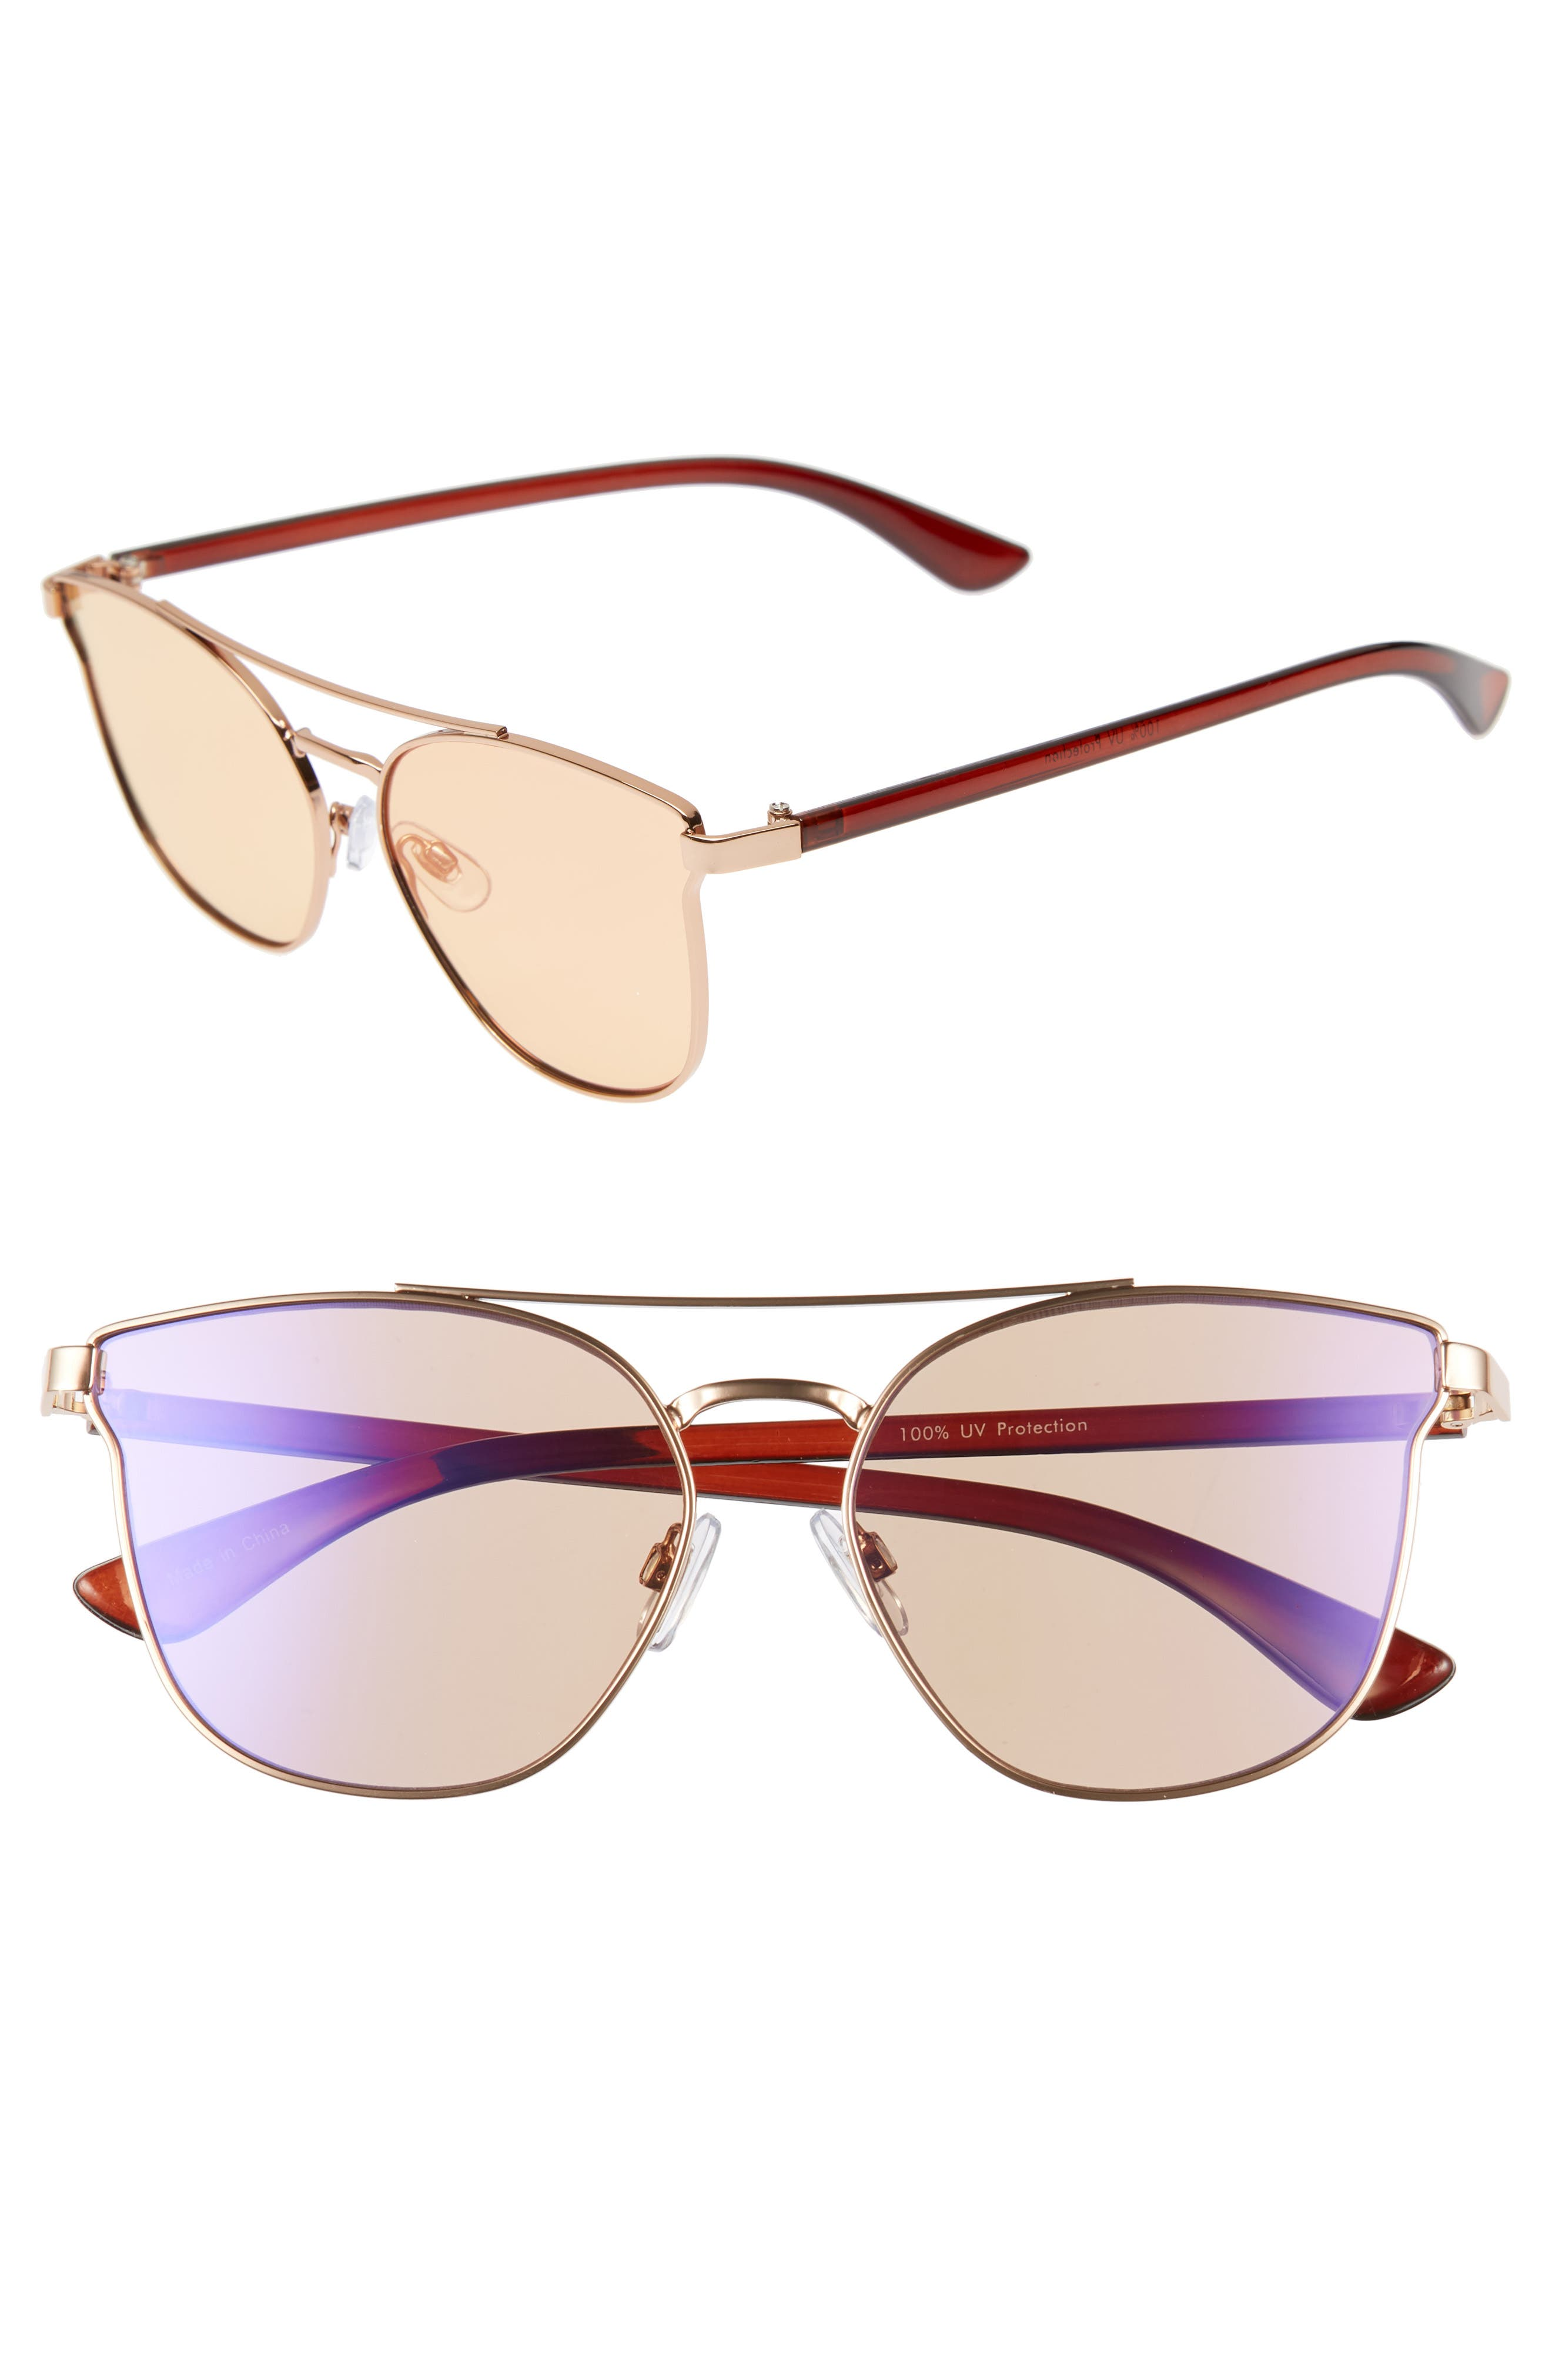 56mm Flat Mirrored Aviator Sunglasses,                             Main thumbnail 1, color,                             BRONZE/ BROWN